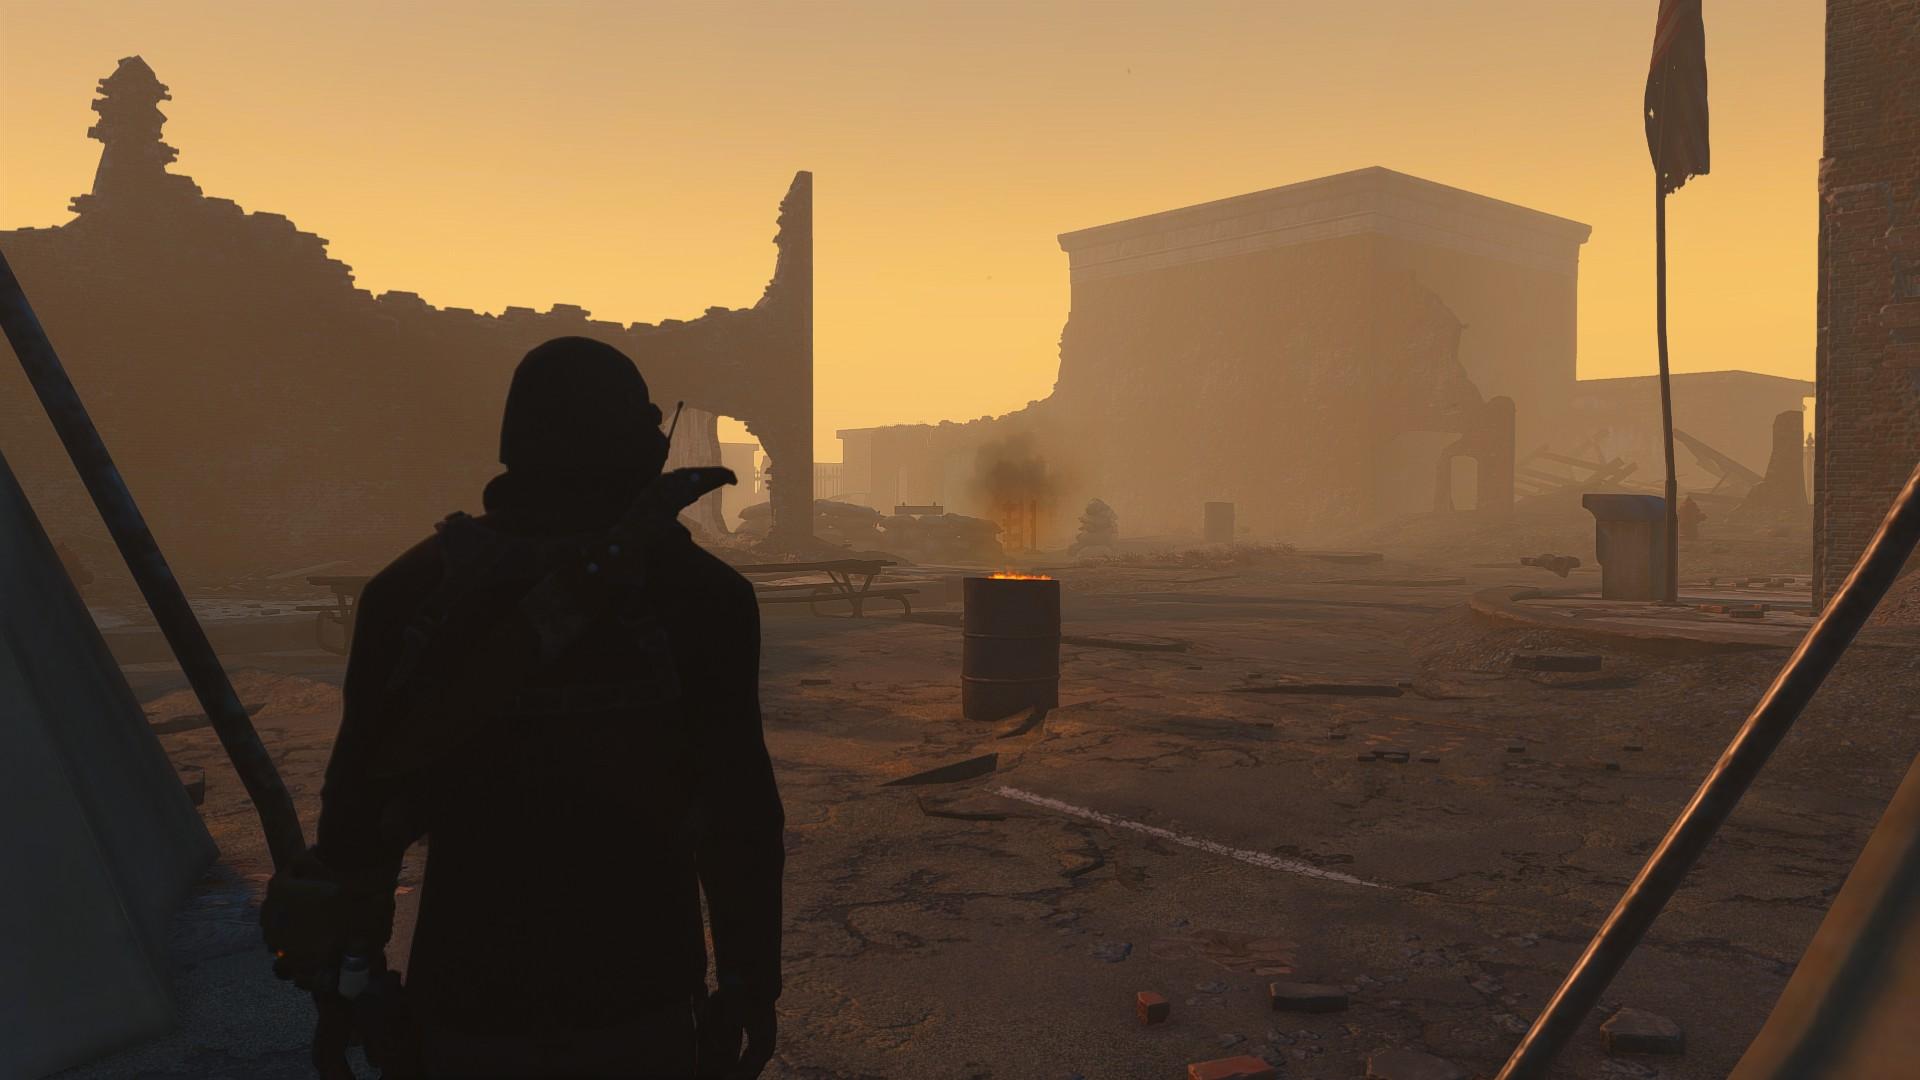 Моддер создает New Vegas в Fallout 4